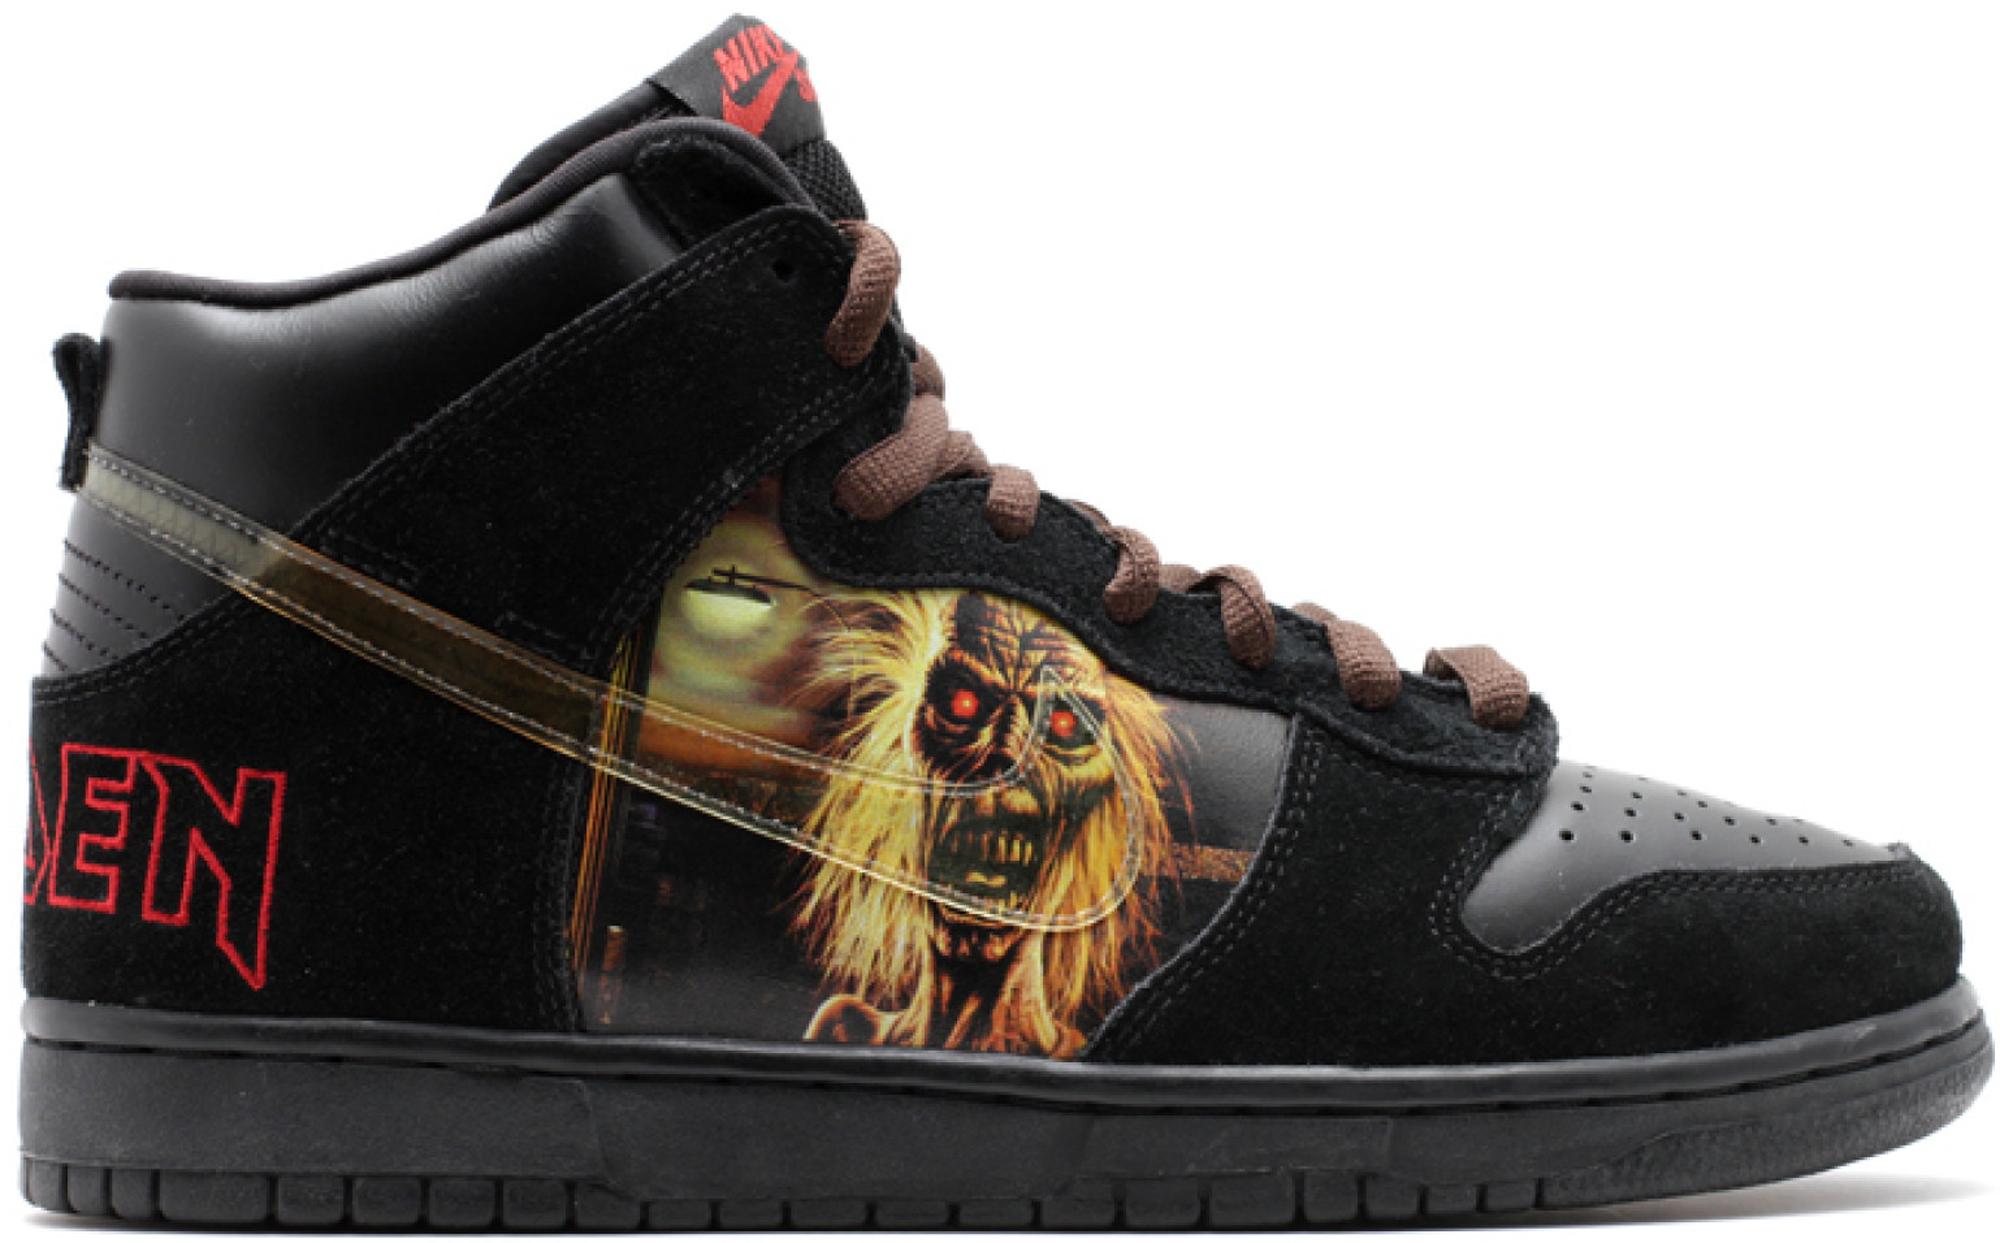 Nike SB Dunk High Iron Maiden - Sneaker